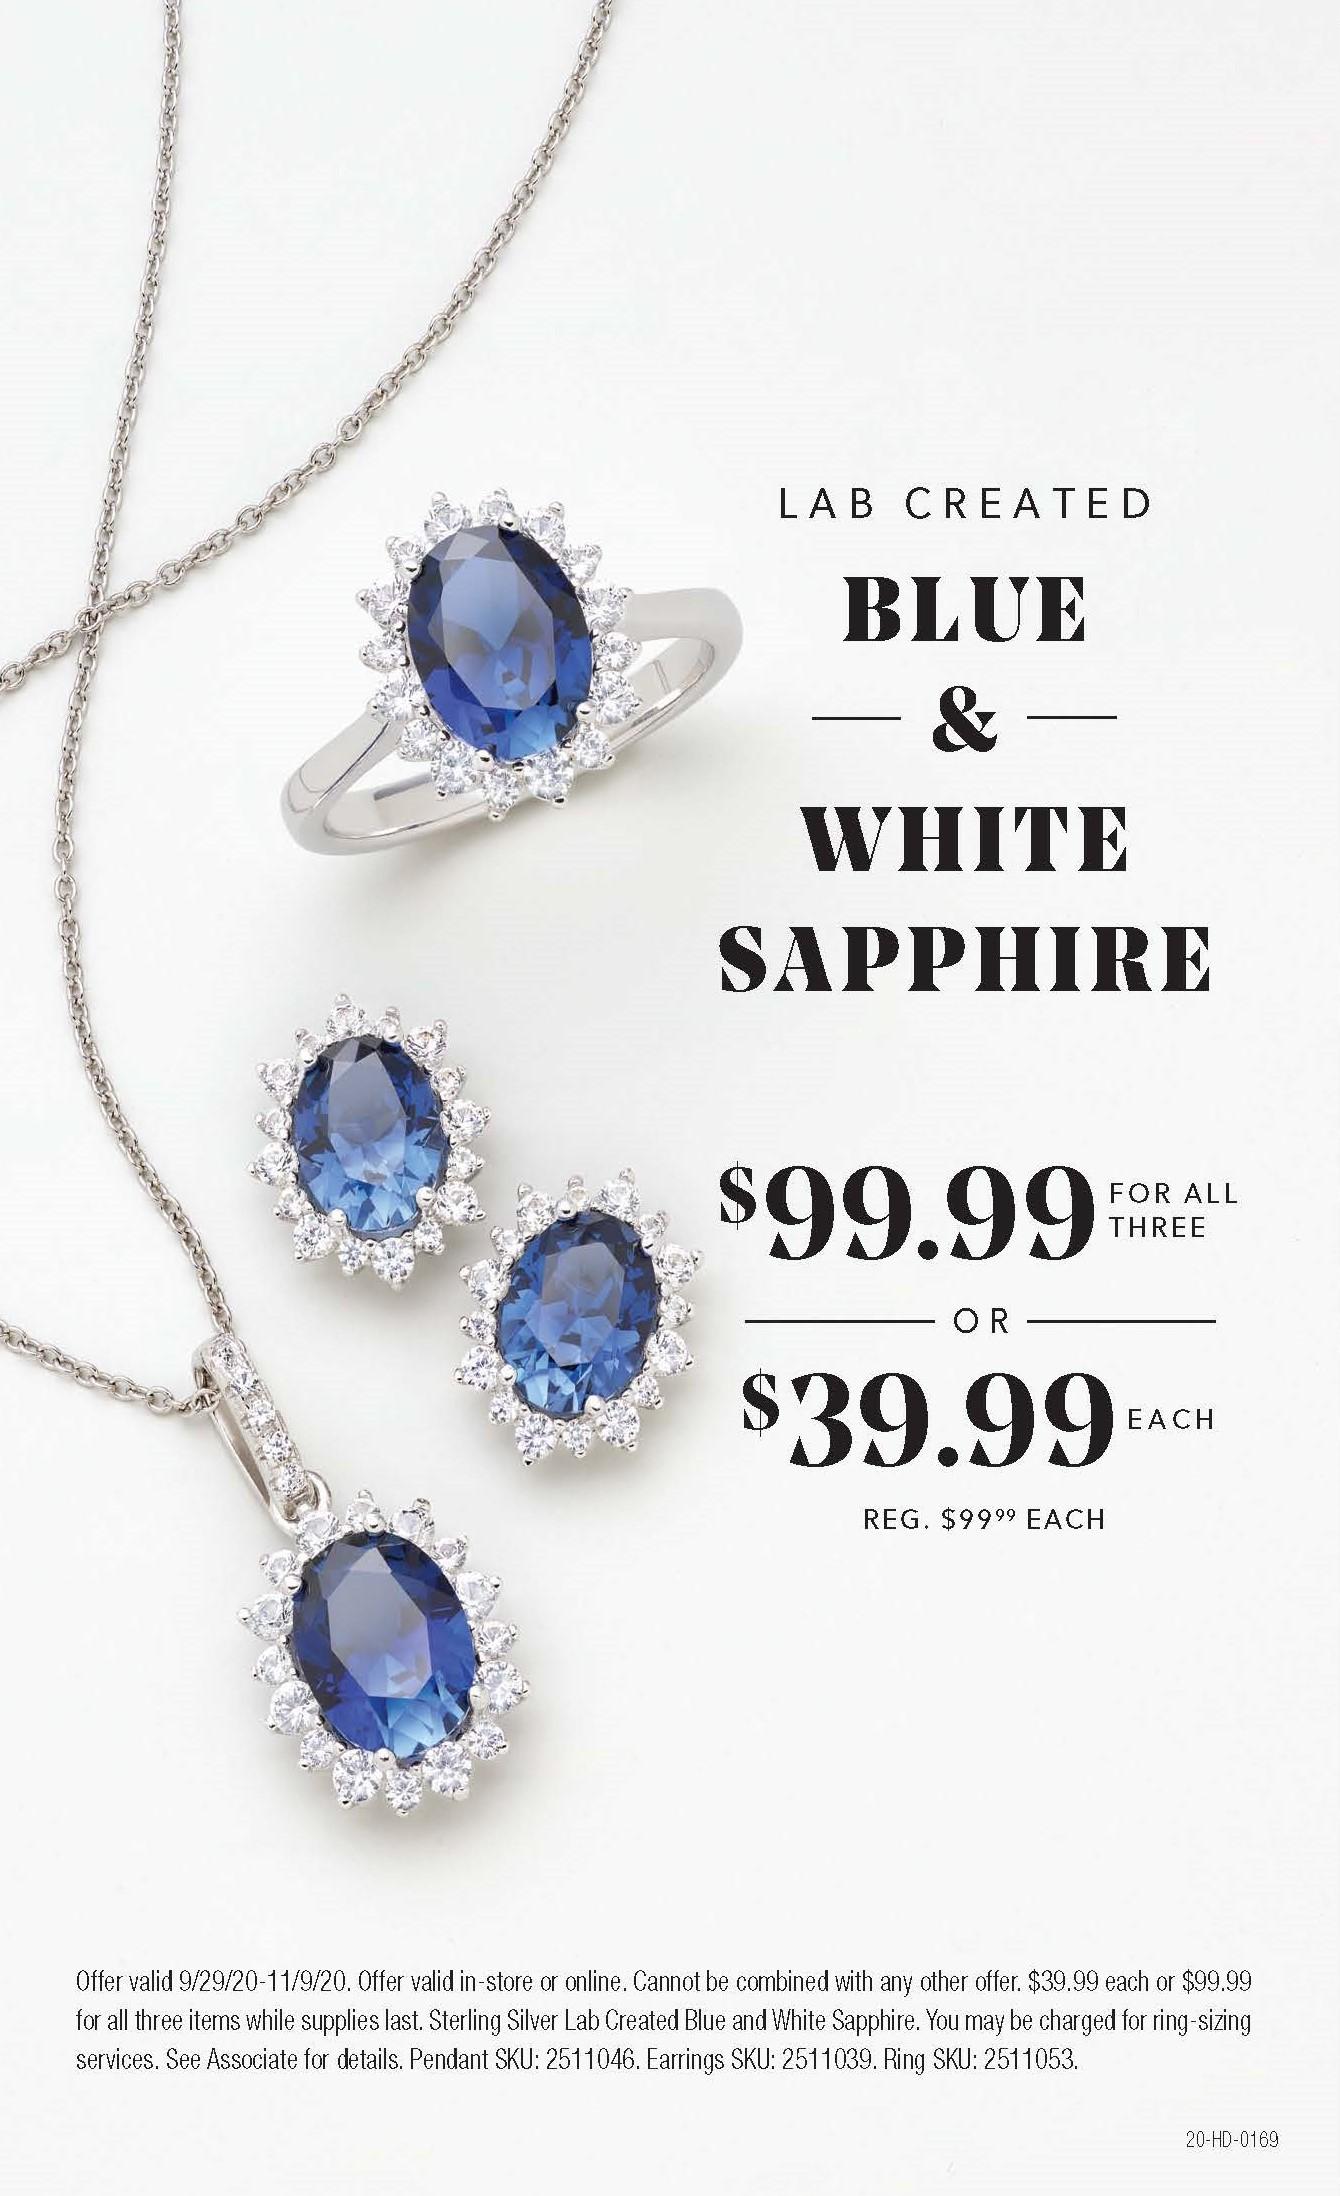 Lab Created Blue & White Sapphire